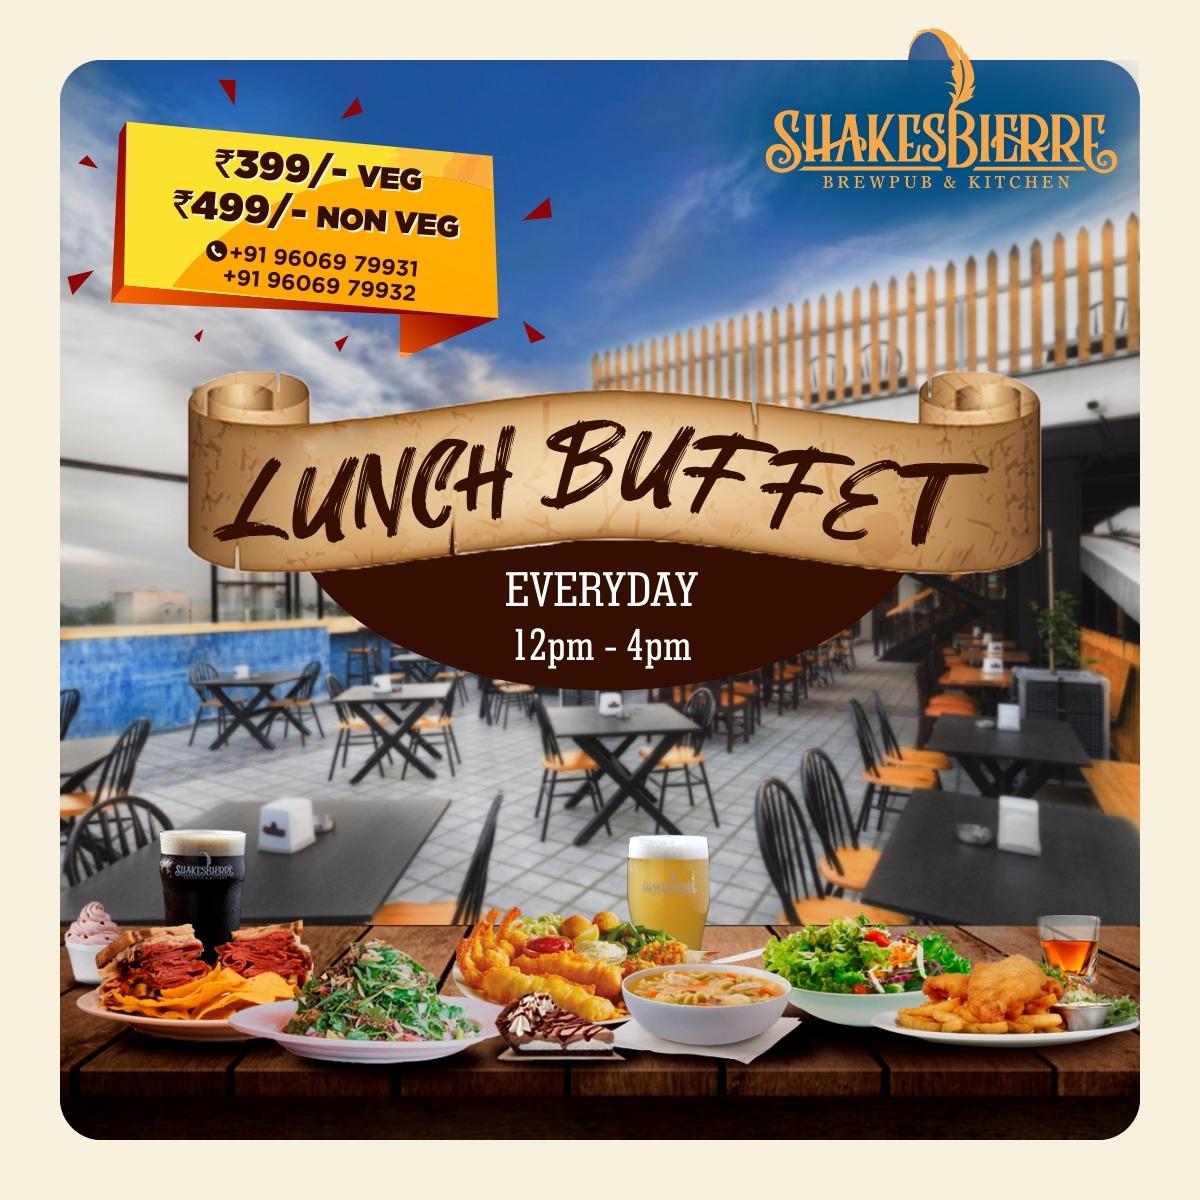 Lavish Lunch Buffet